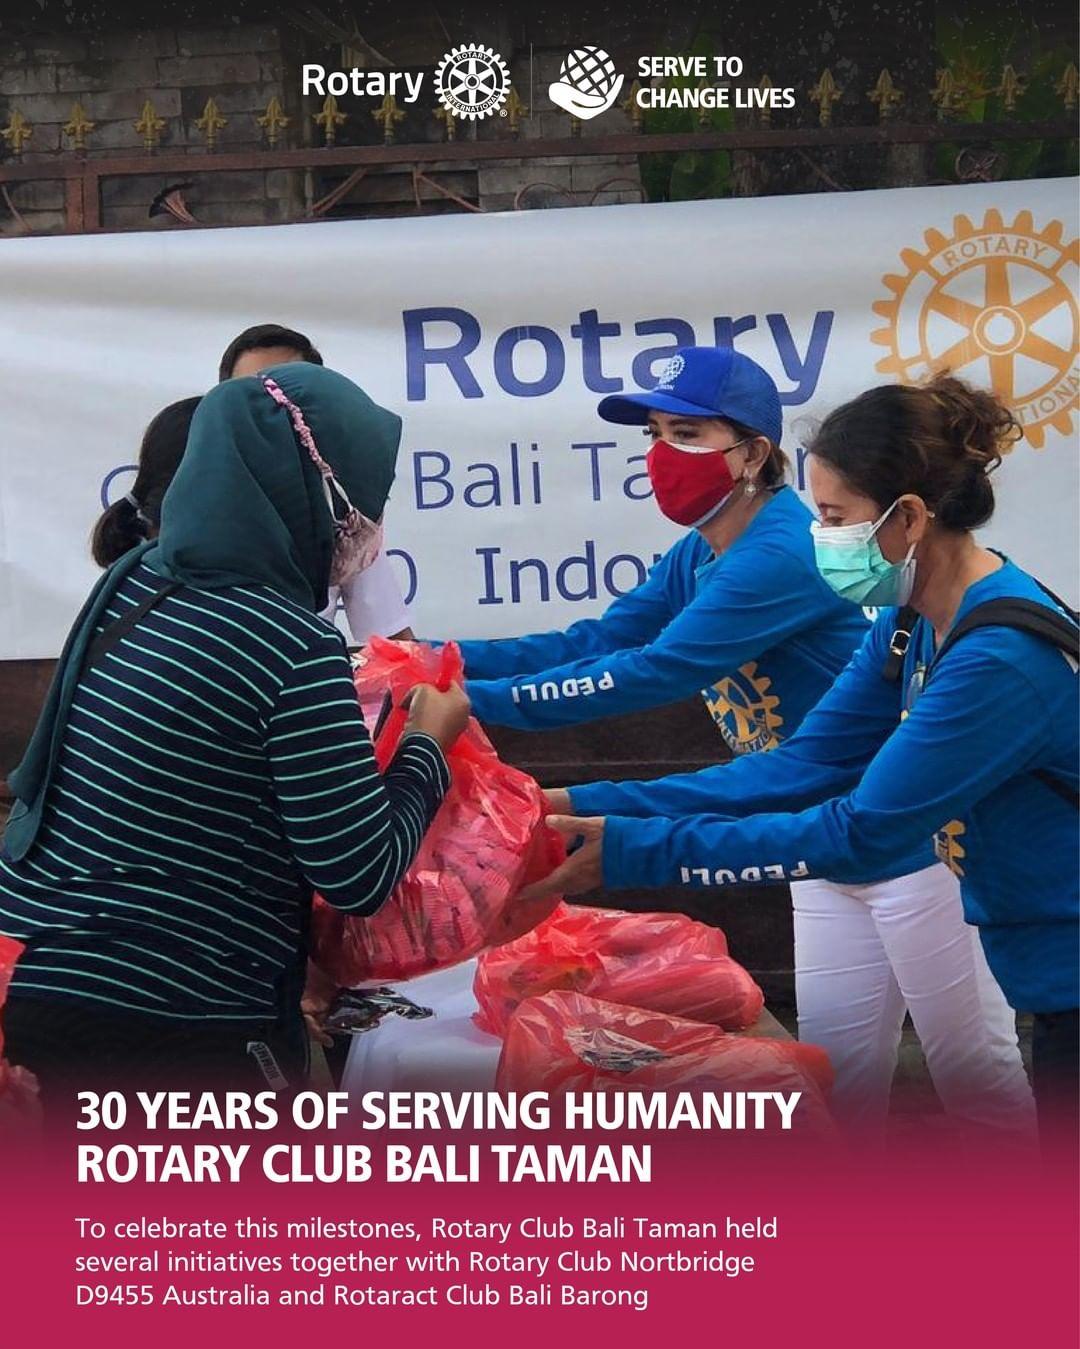 30 Years of Serving Humanity Rotary Club Bali Taman